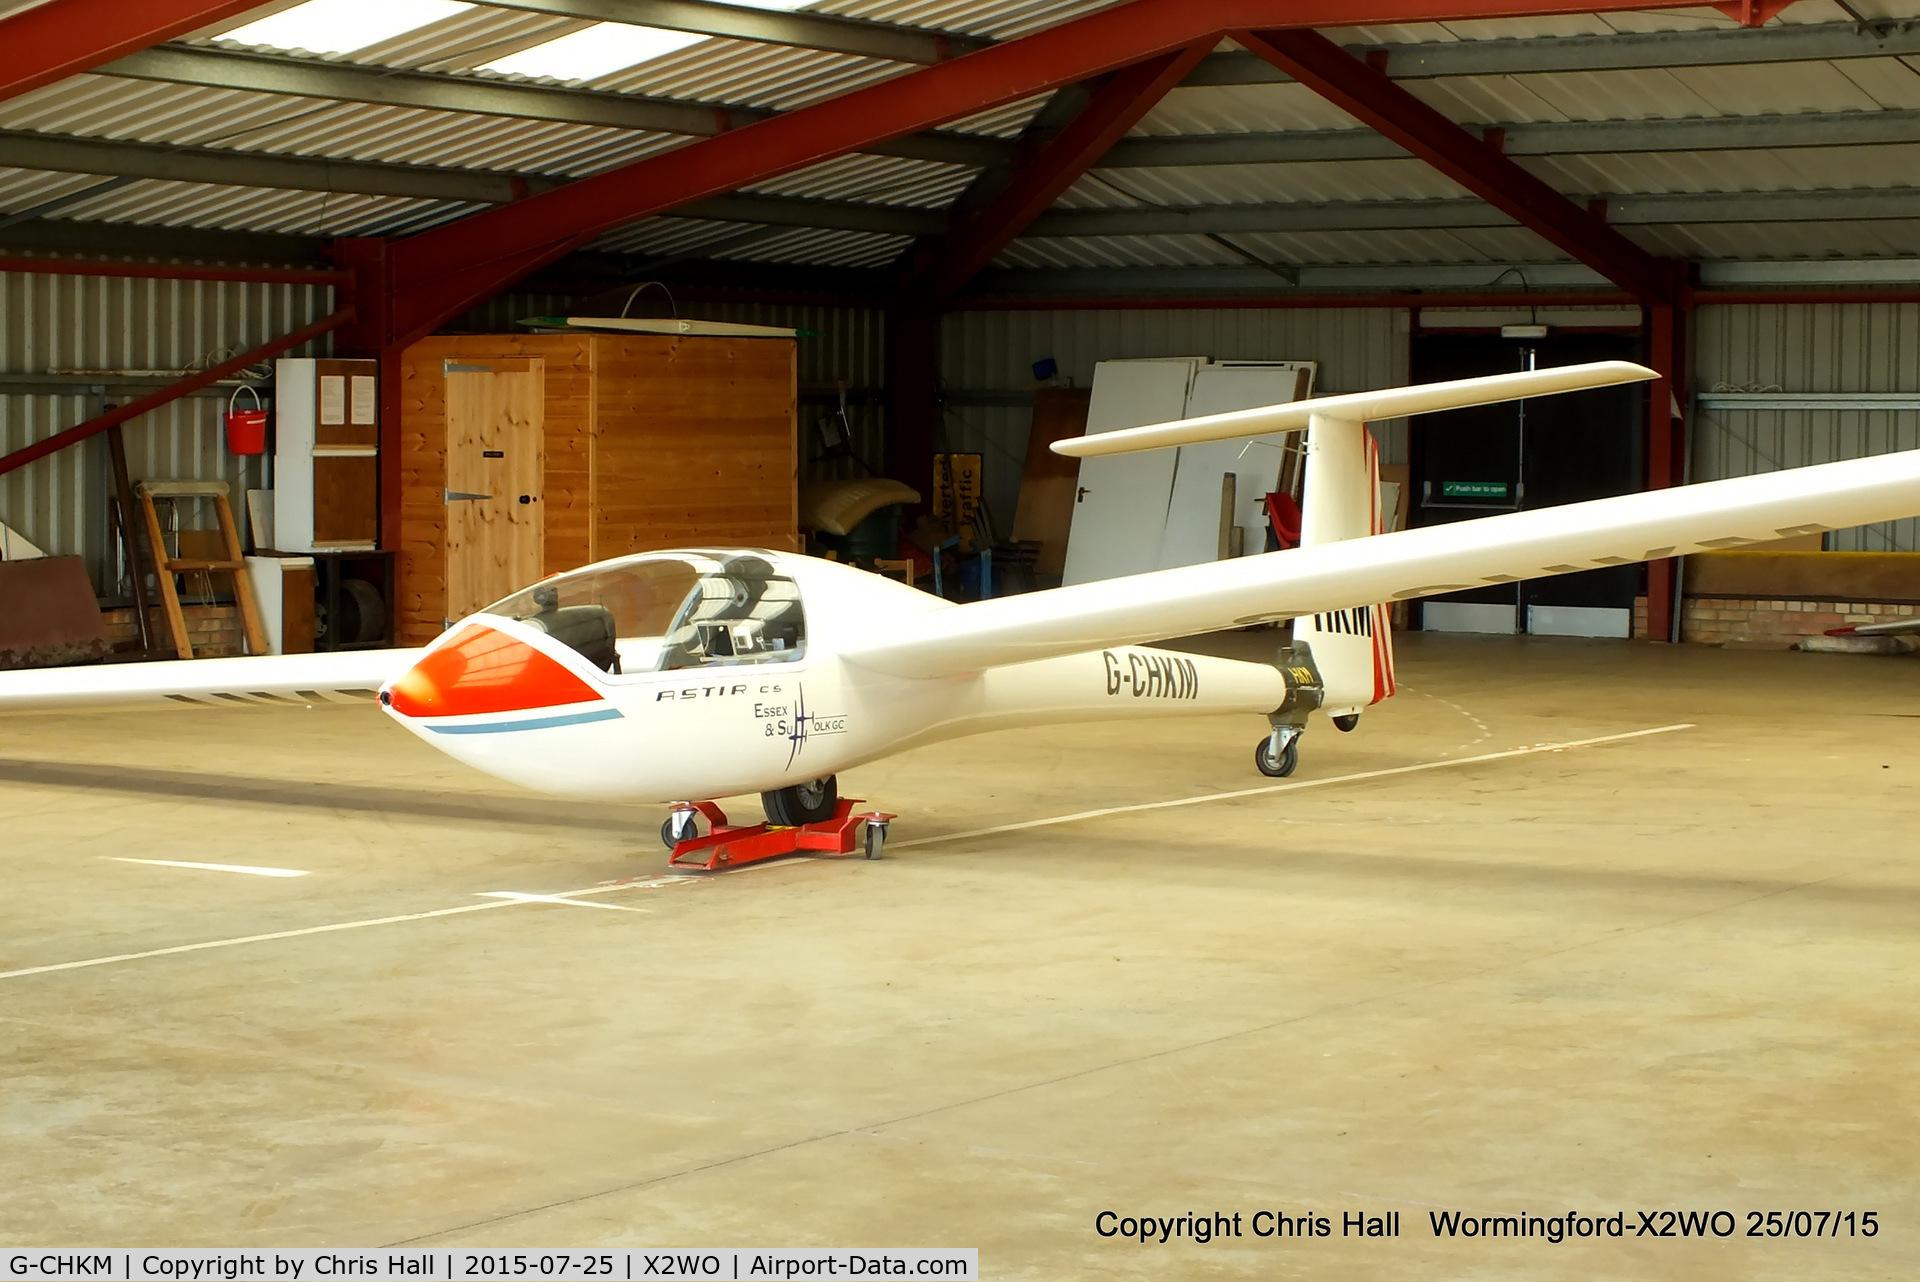 G-CHKM, 1976 Grob G-102 Astir CS Jeans C/N 2108, at Wormingford airfield